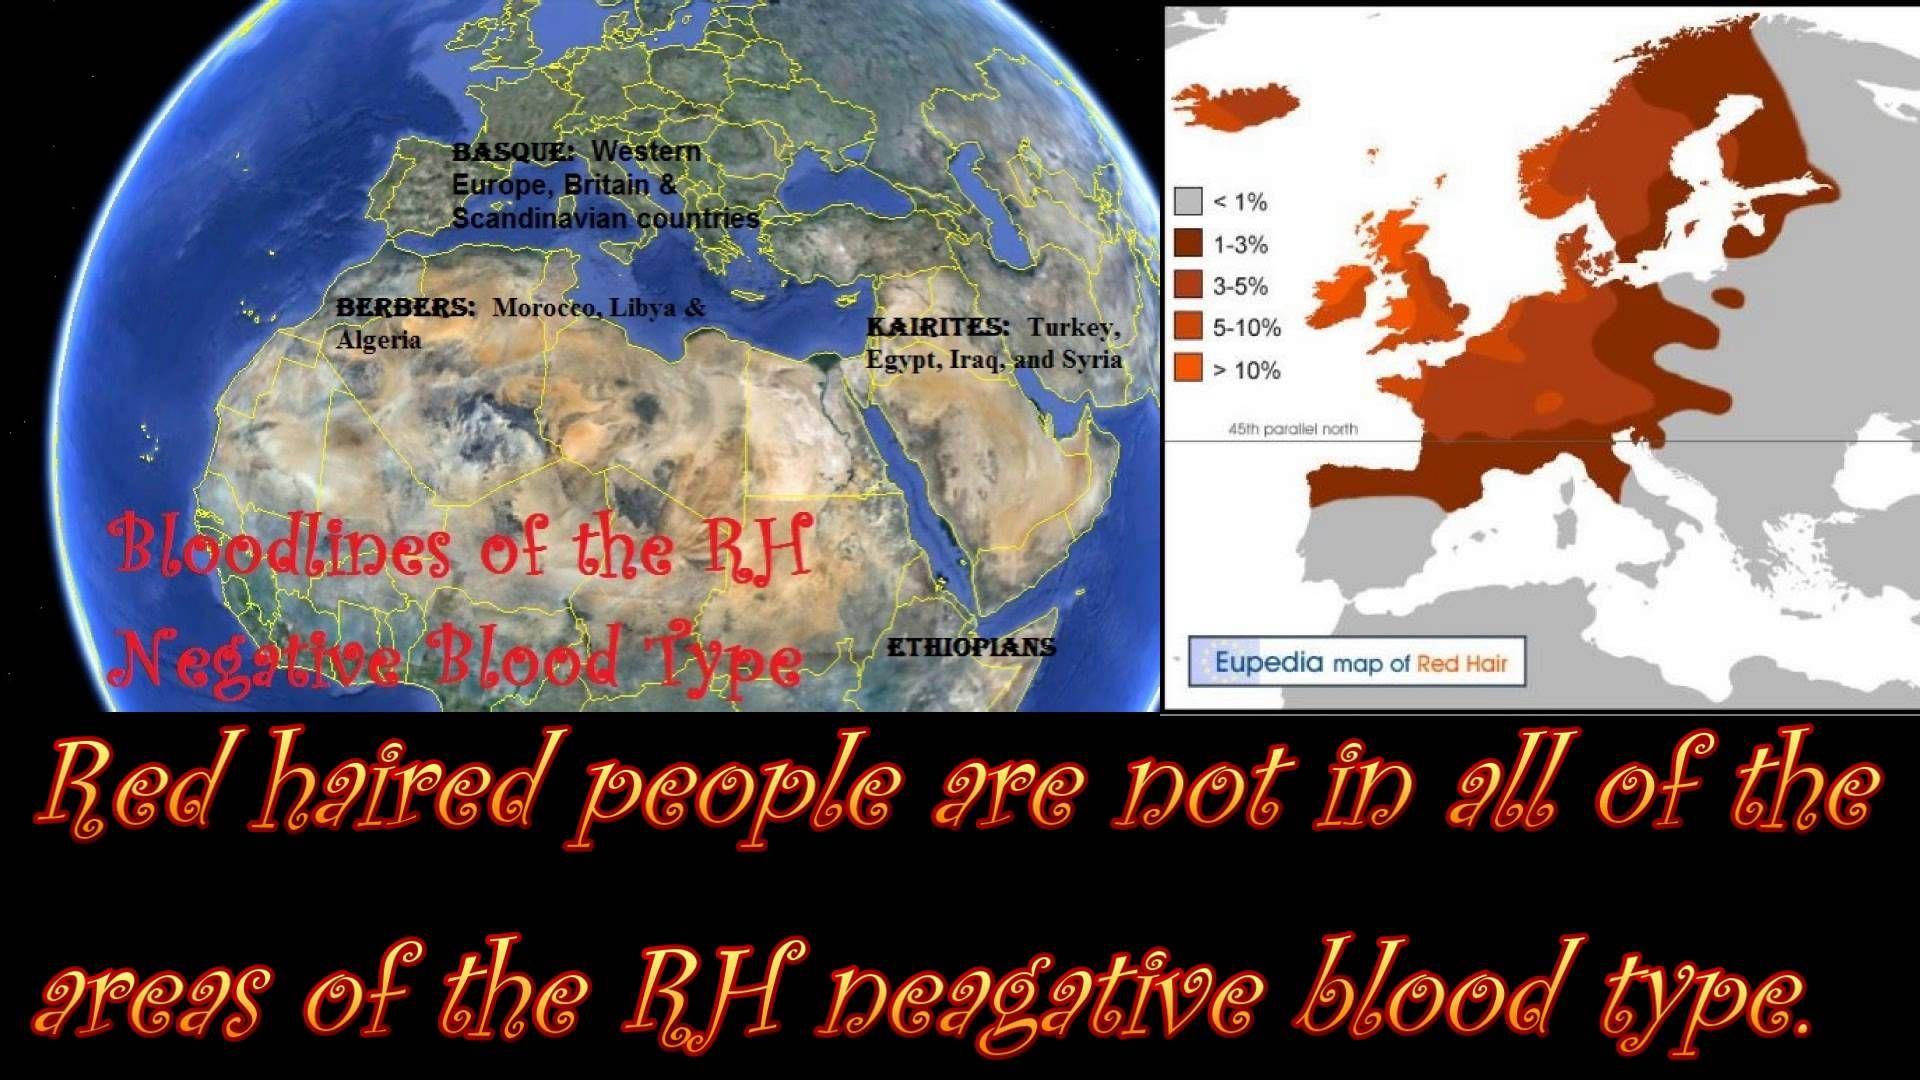 Rh Negative blood type - AnthroScape